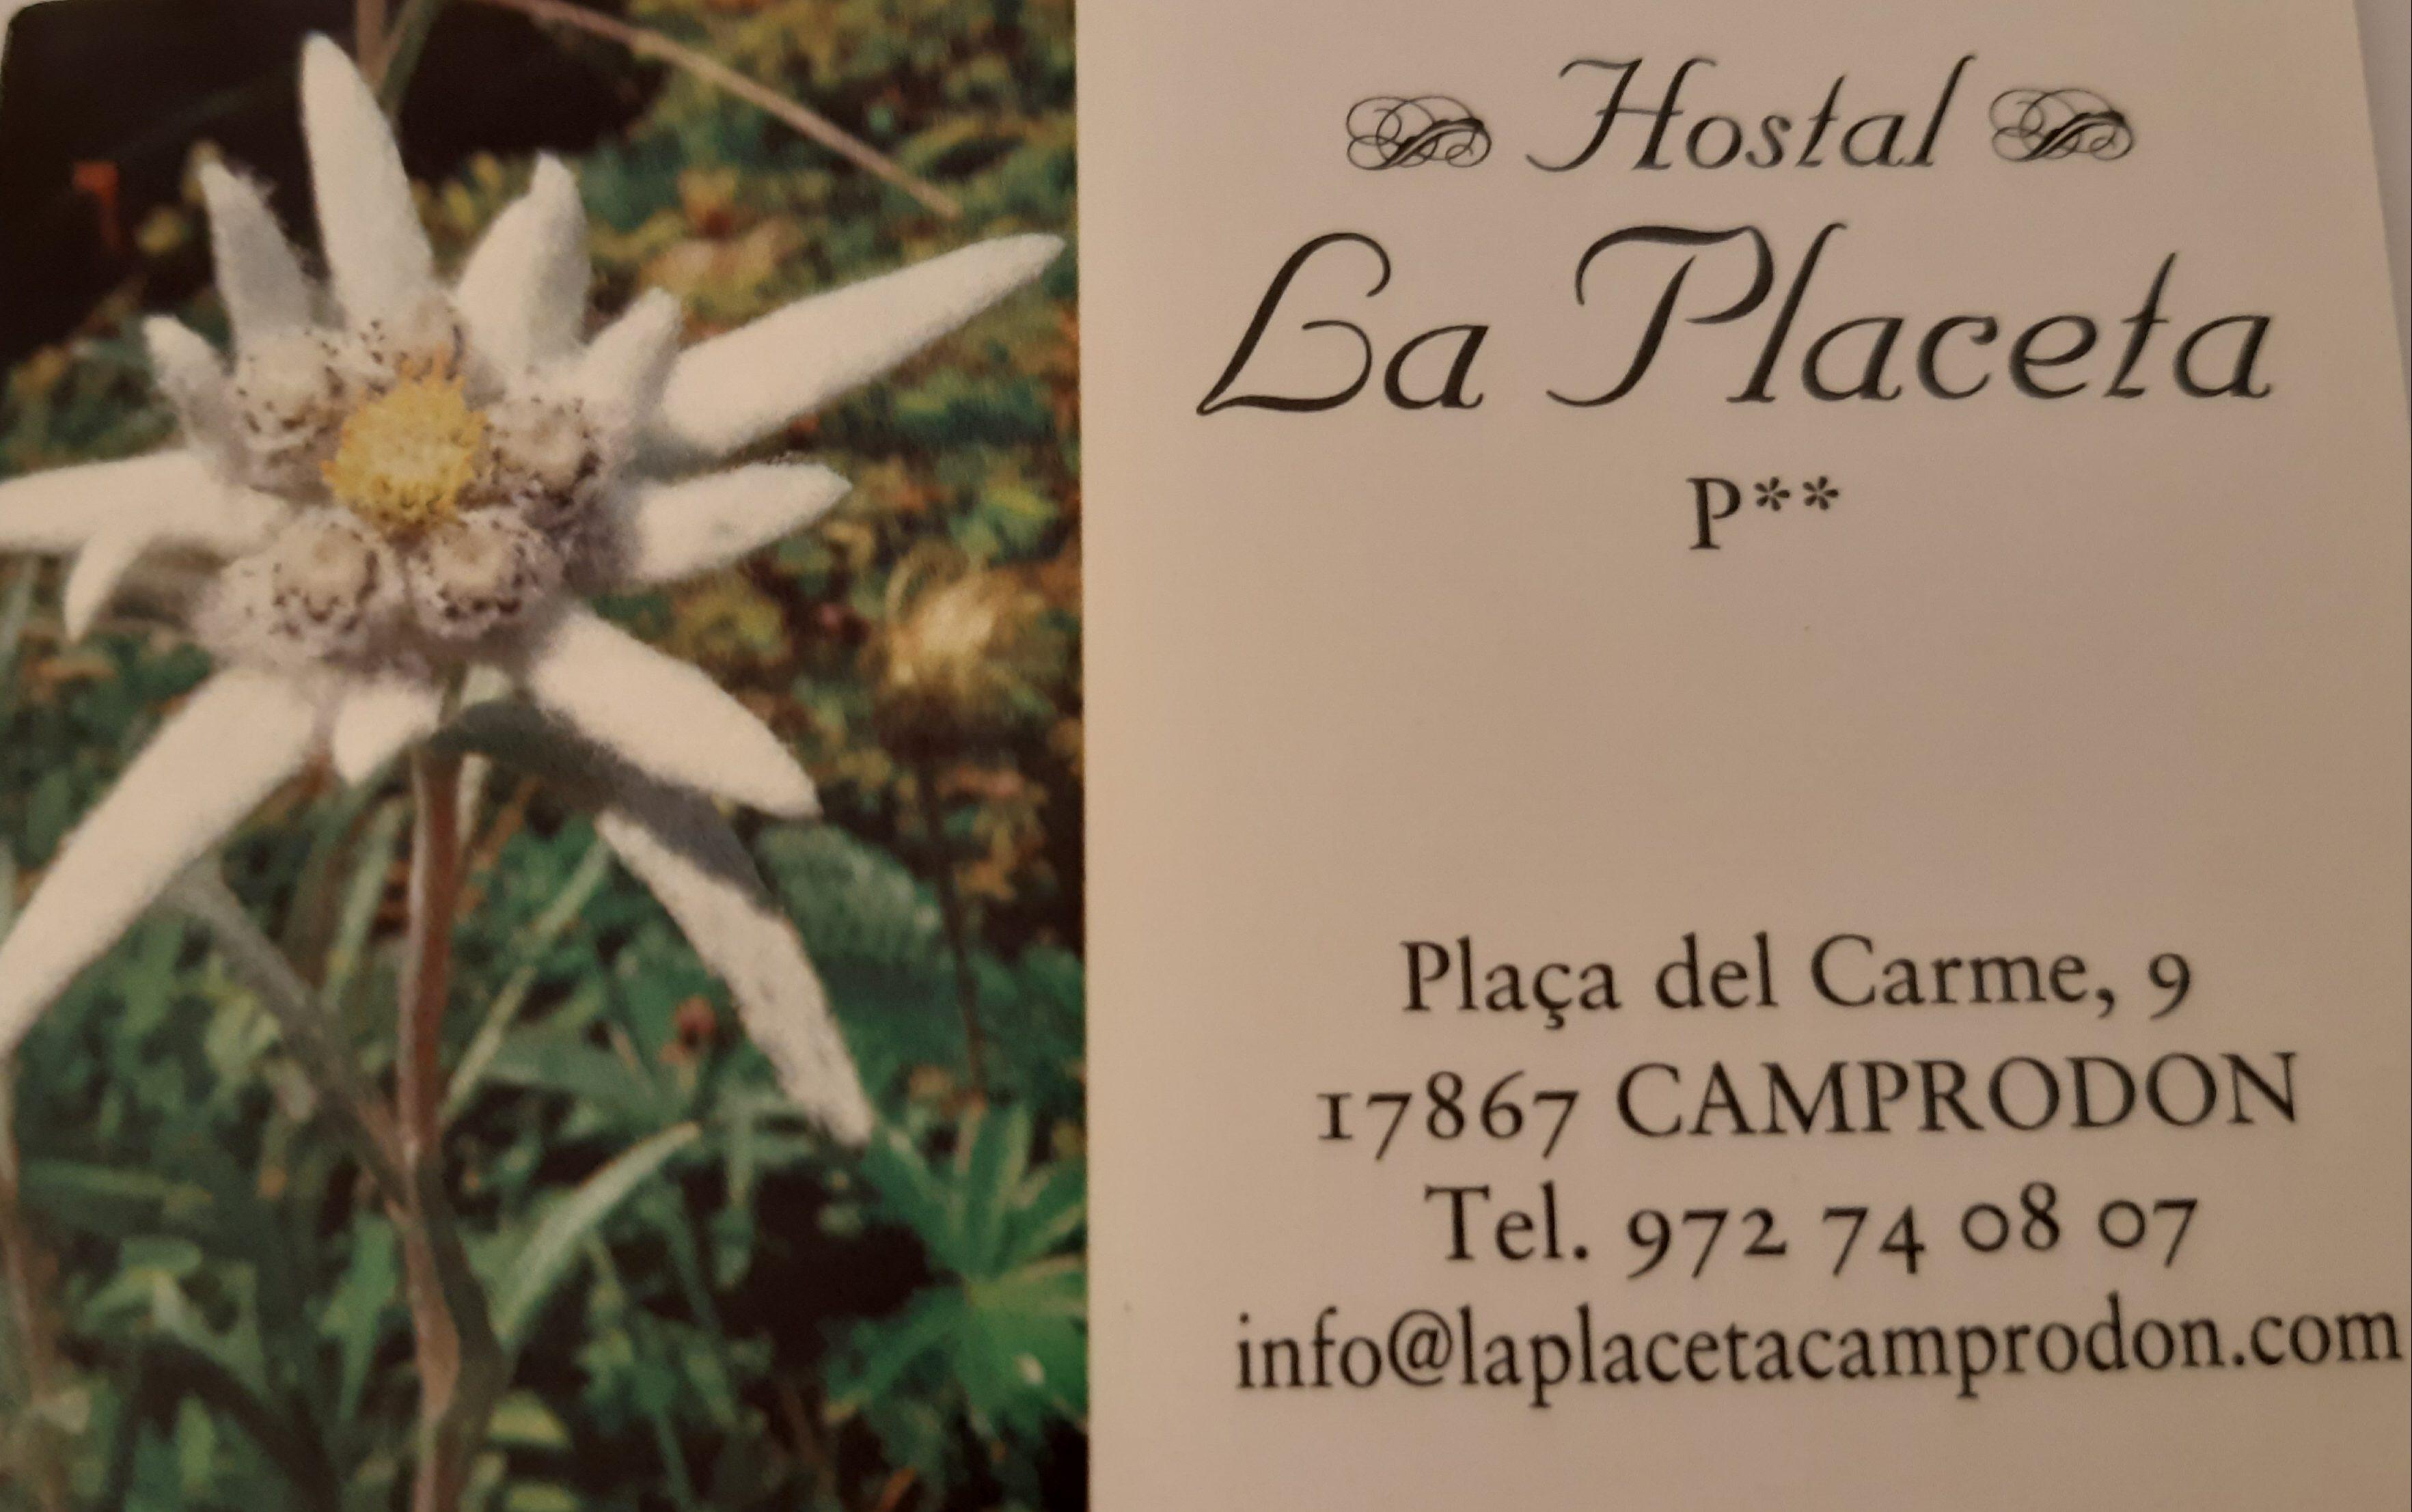 Hostal La Placeta de Camprodon